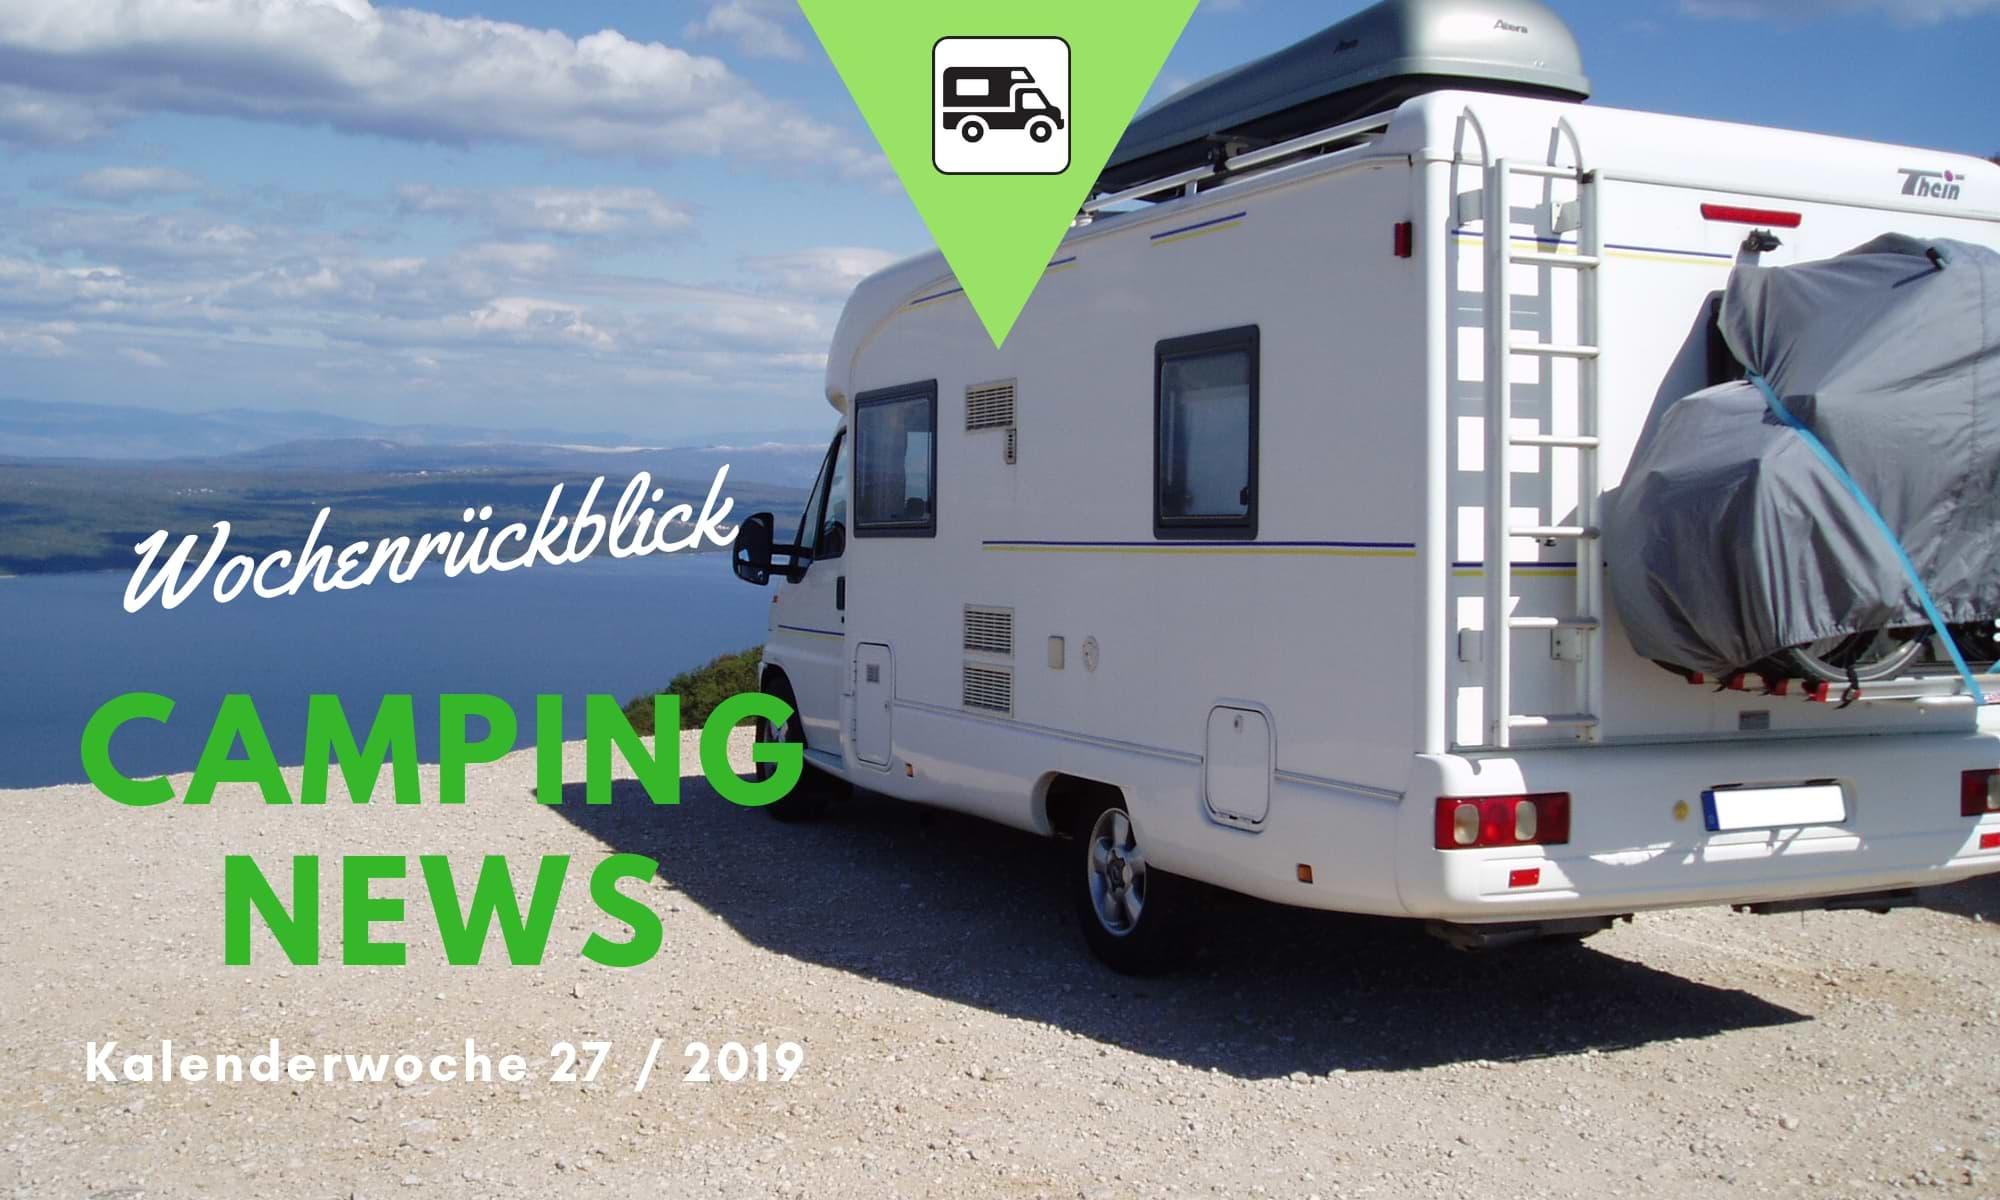 Wochenrückblick Camping News KW27-2019